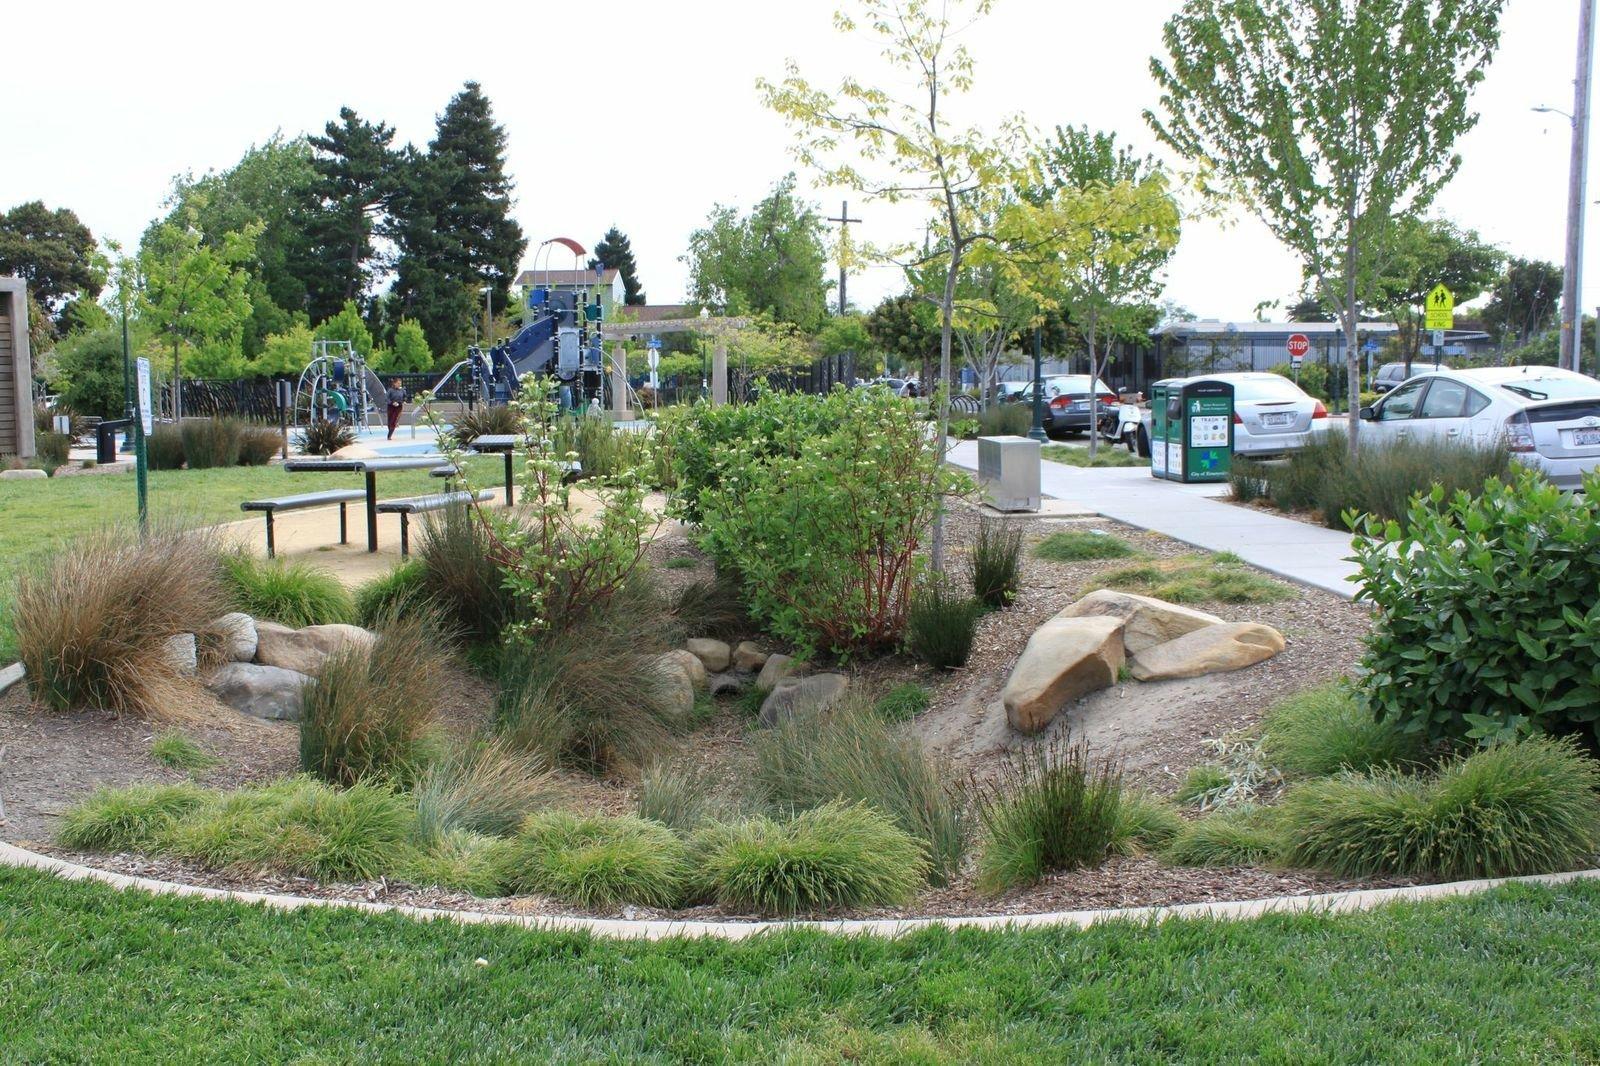 Bio-retenční nádrž v Doyle-Hollis Park v Emeryville, CA. Zdroj: NEMO, Univerzita Connecticut